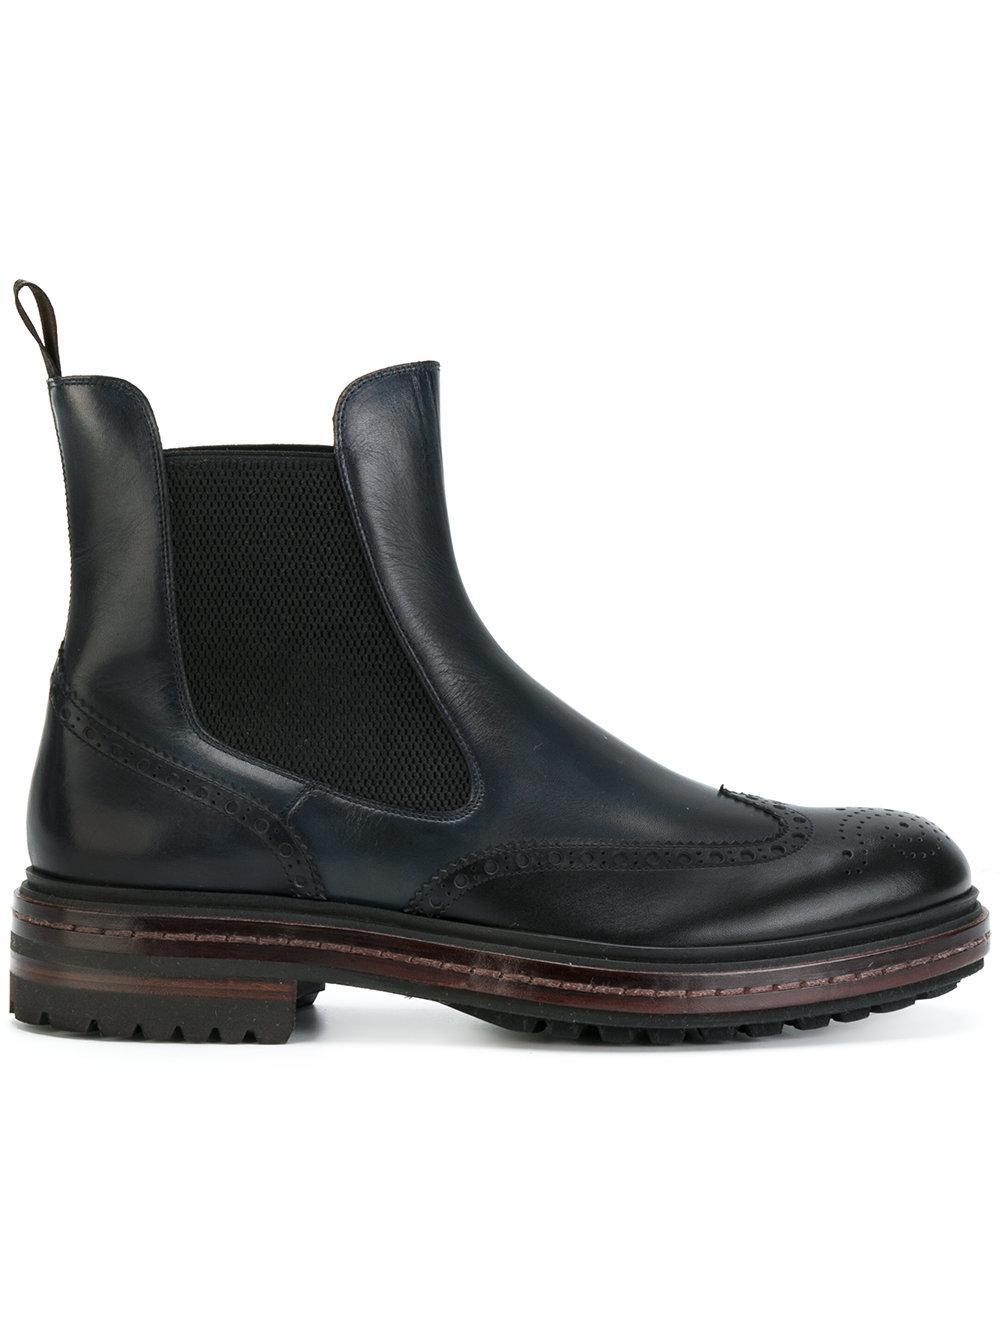 fd34bbbf51454 Santoni Beatles Ankle Boots in Blue - Lyst